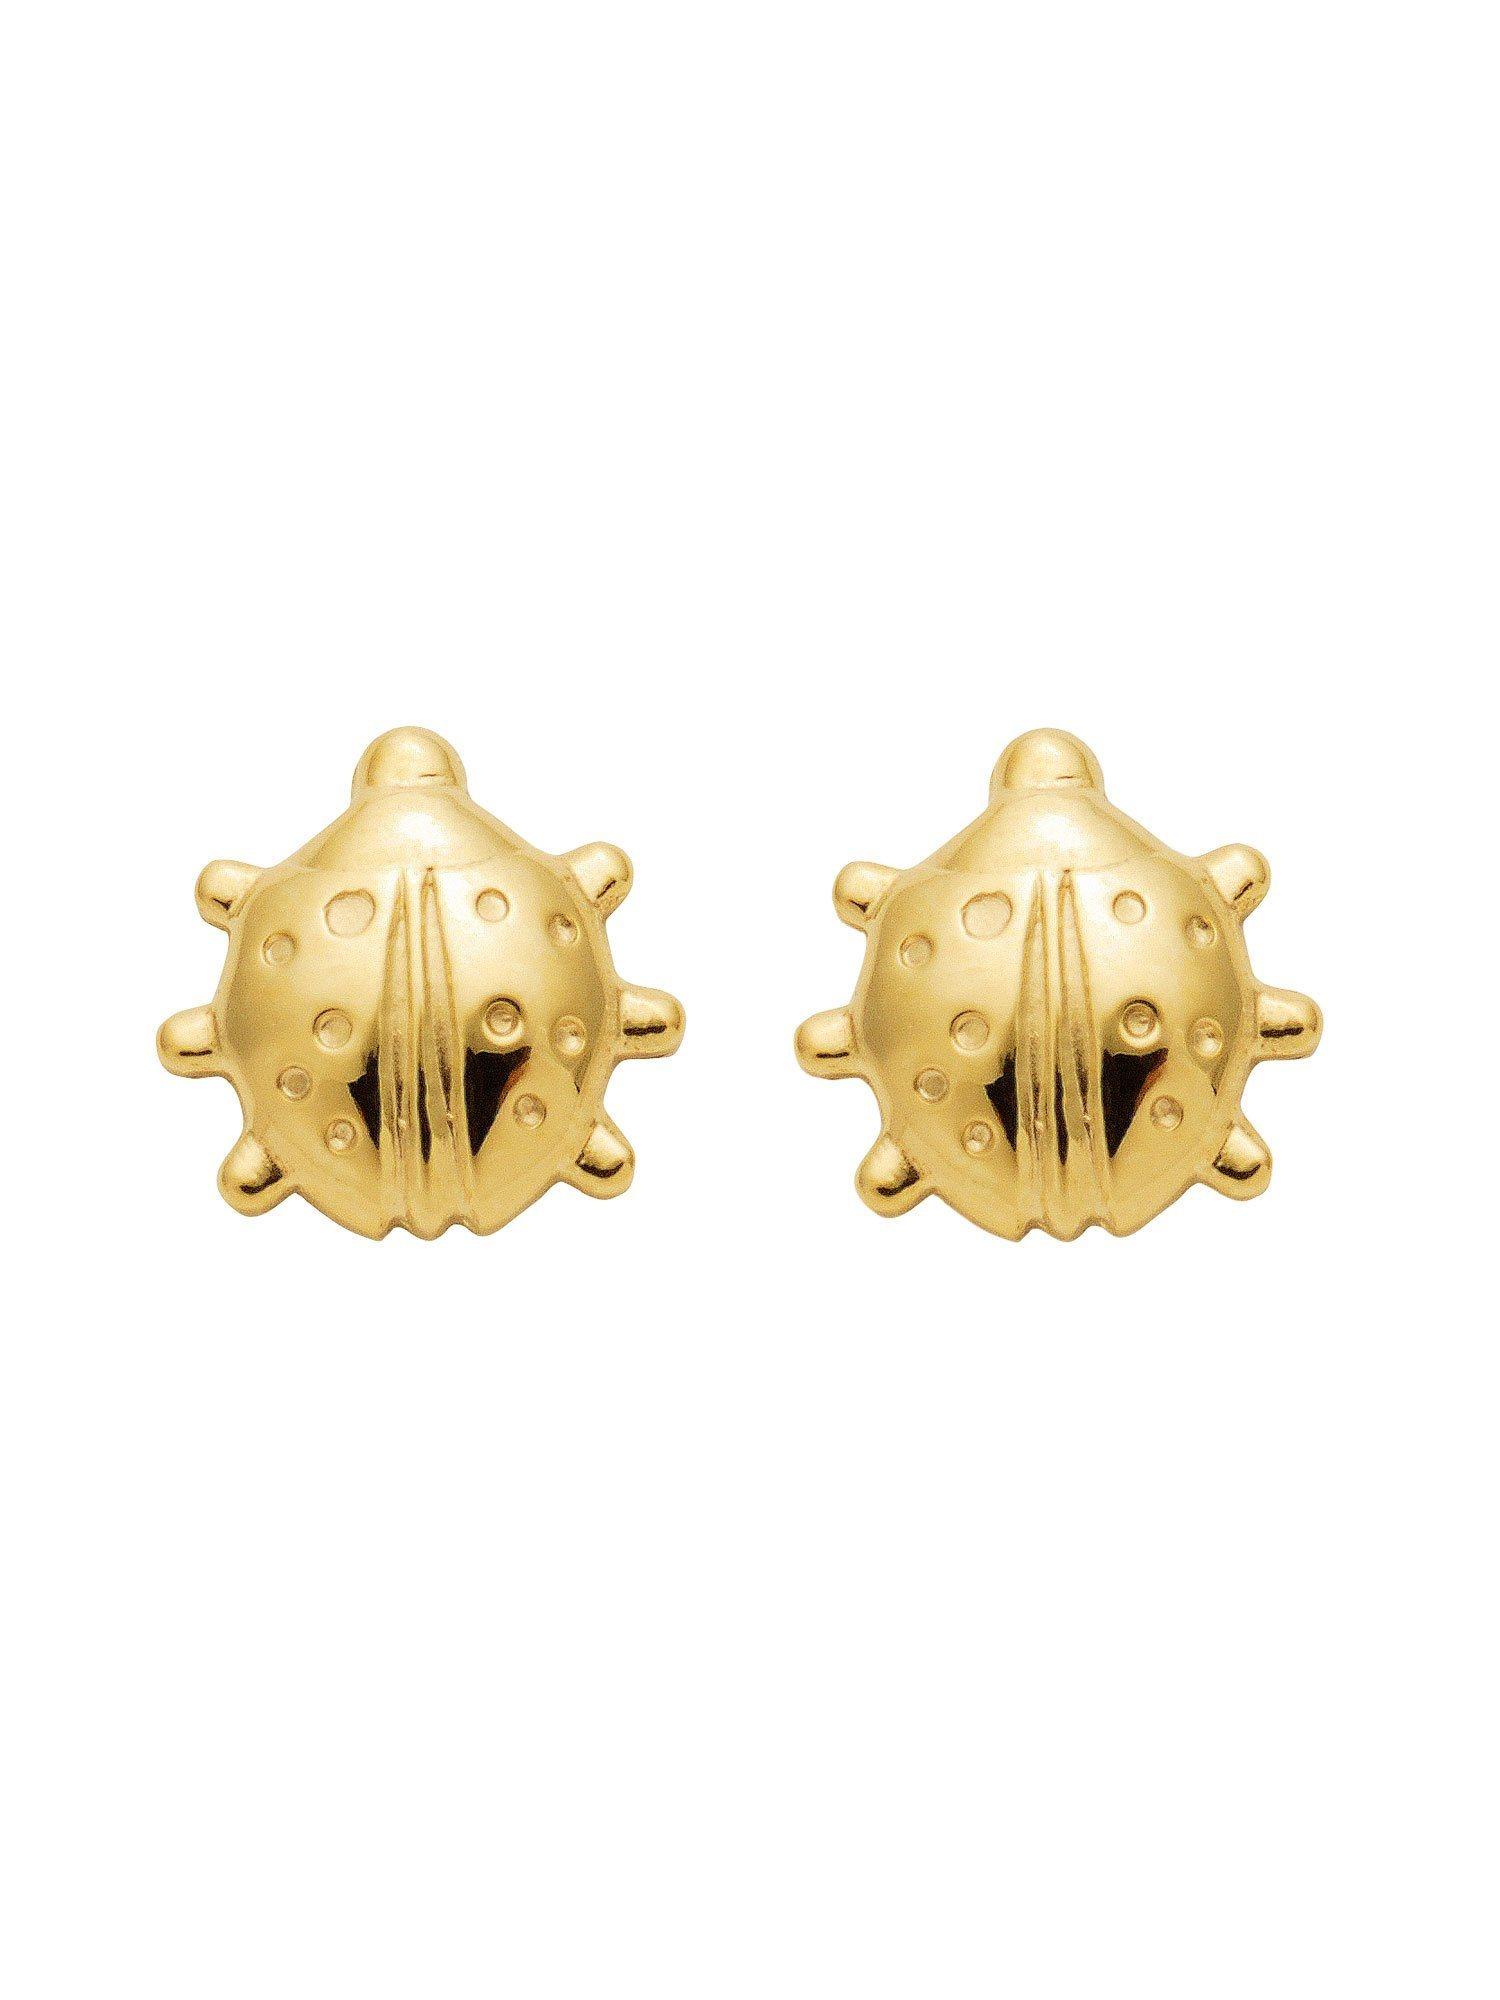 Adelia´s Paar Ohrstecker »Gold Ohrringe« Marienkäfer 8 k 333 Gelbgold | Schmuck > Ohrschmuck & Ohrringe > Ohrstecker | Adelia´s